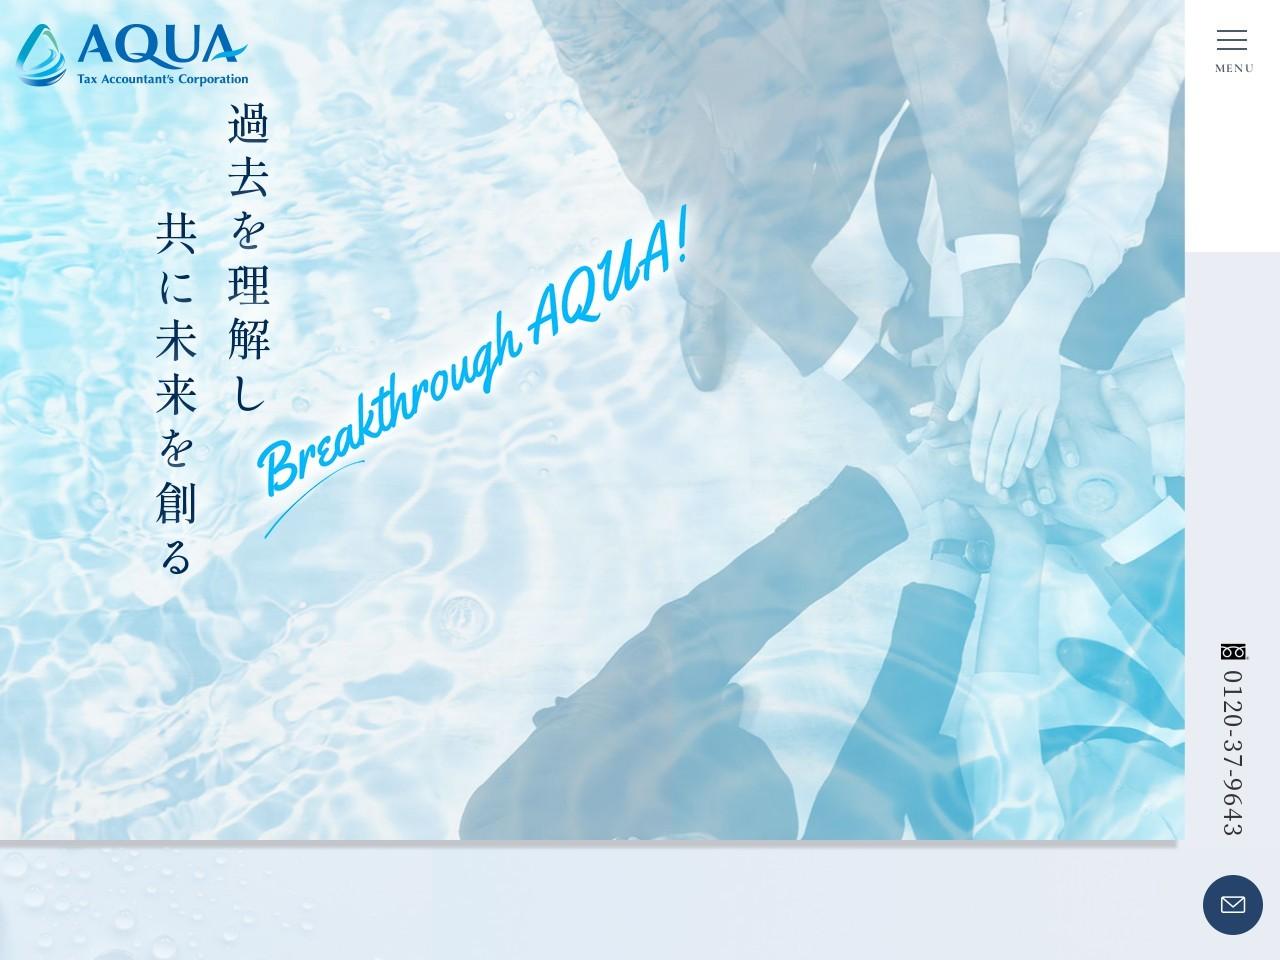 アクア(税理士法人)